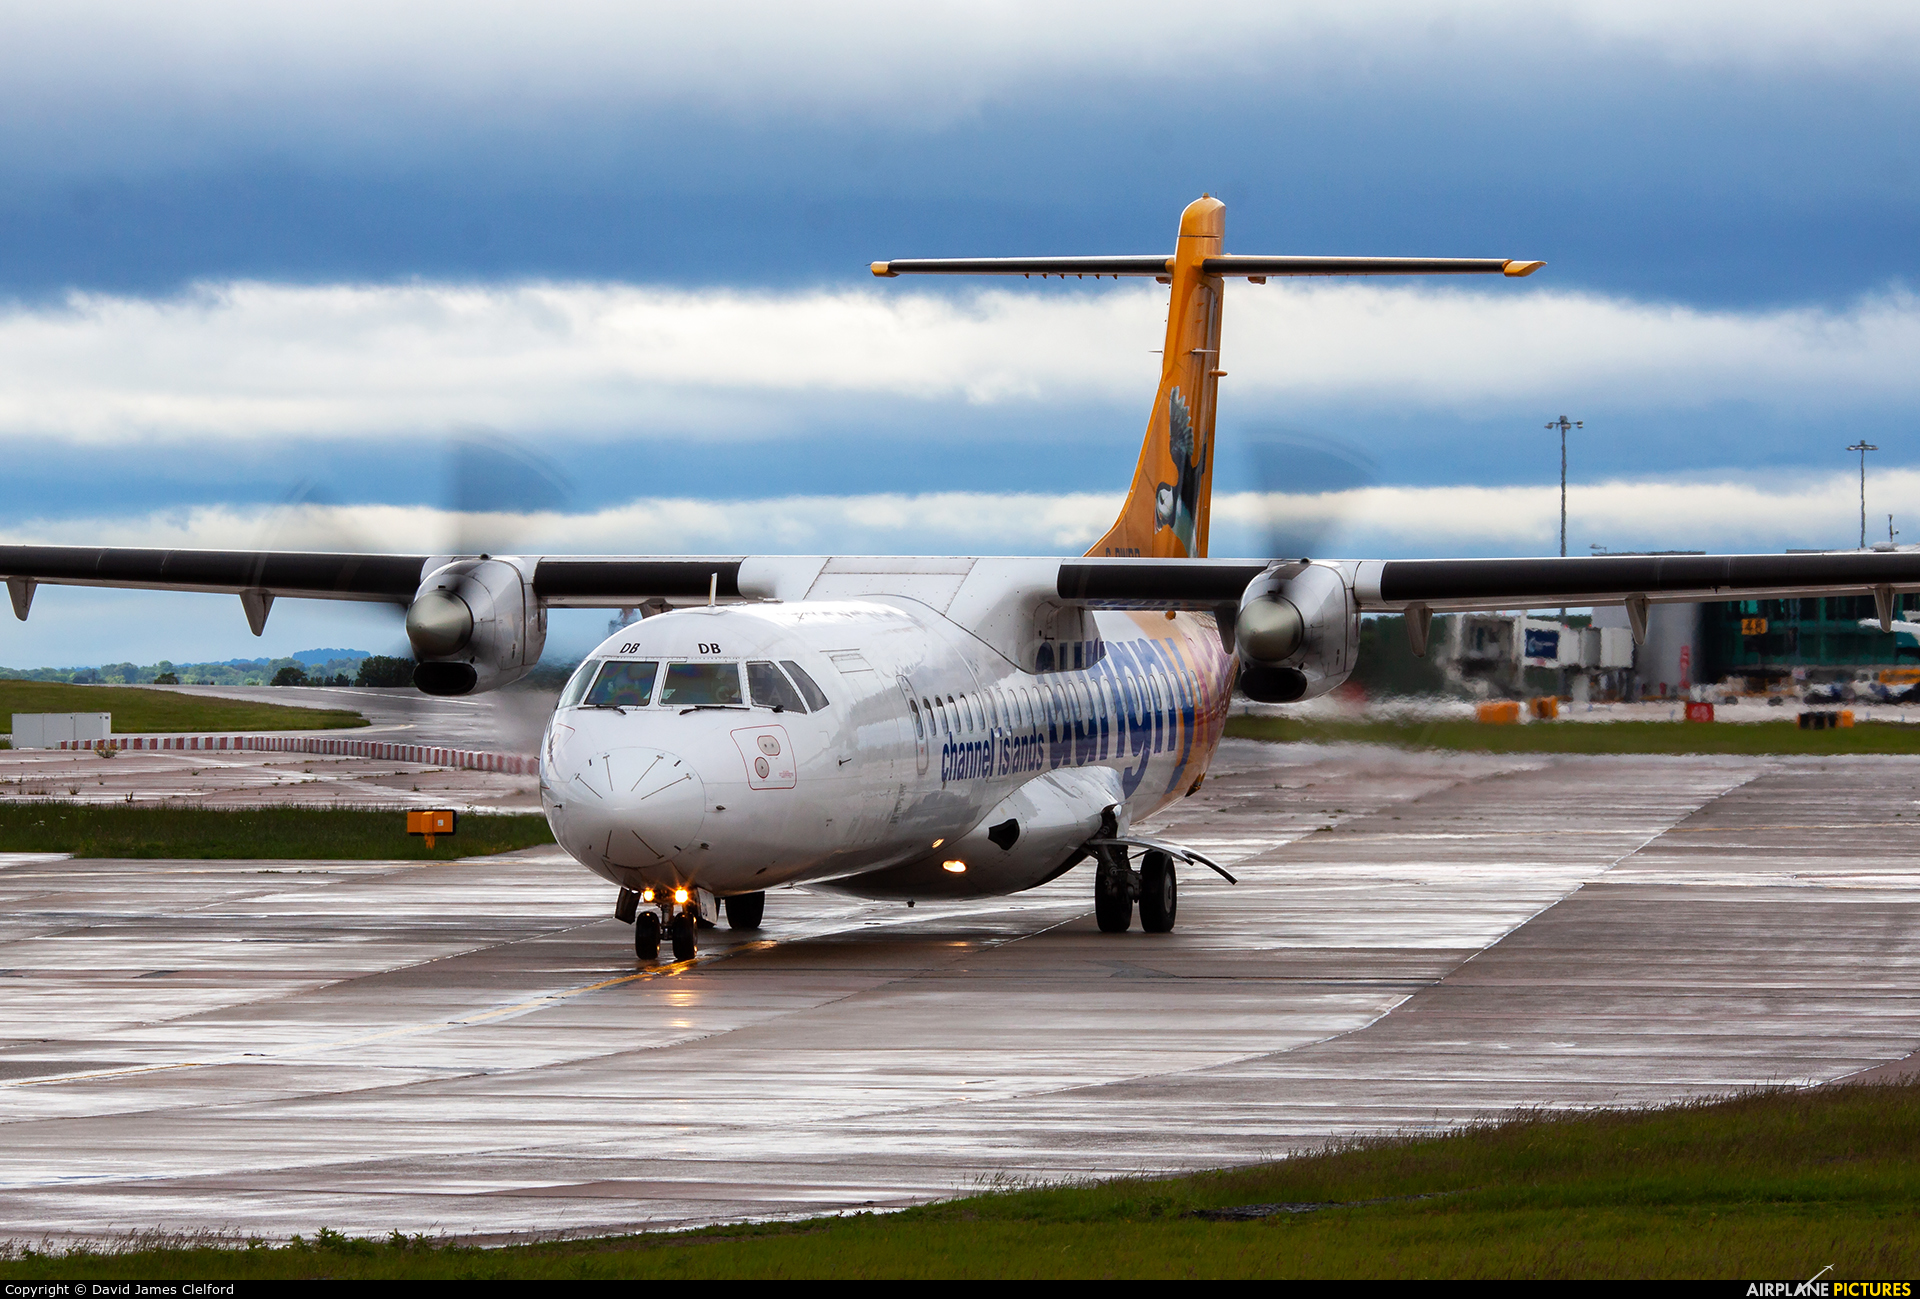 Aurigny Air Services G-BWDB aircraft at Manchester